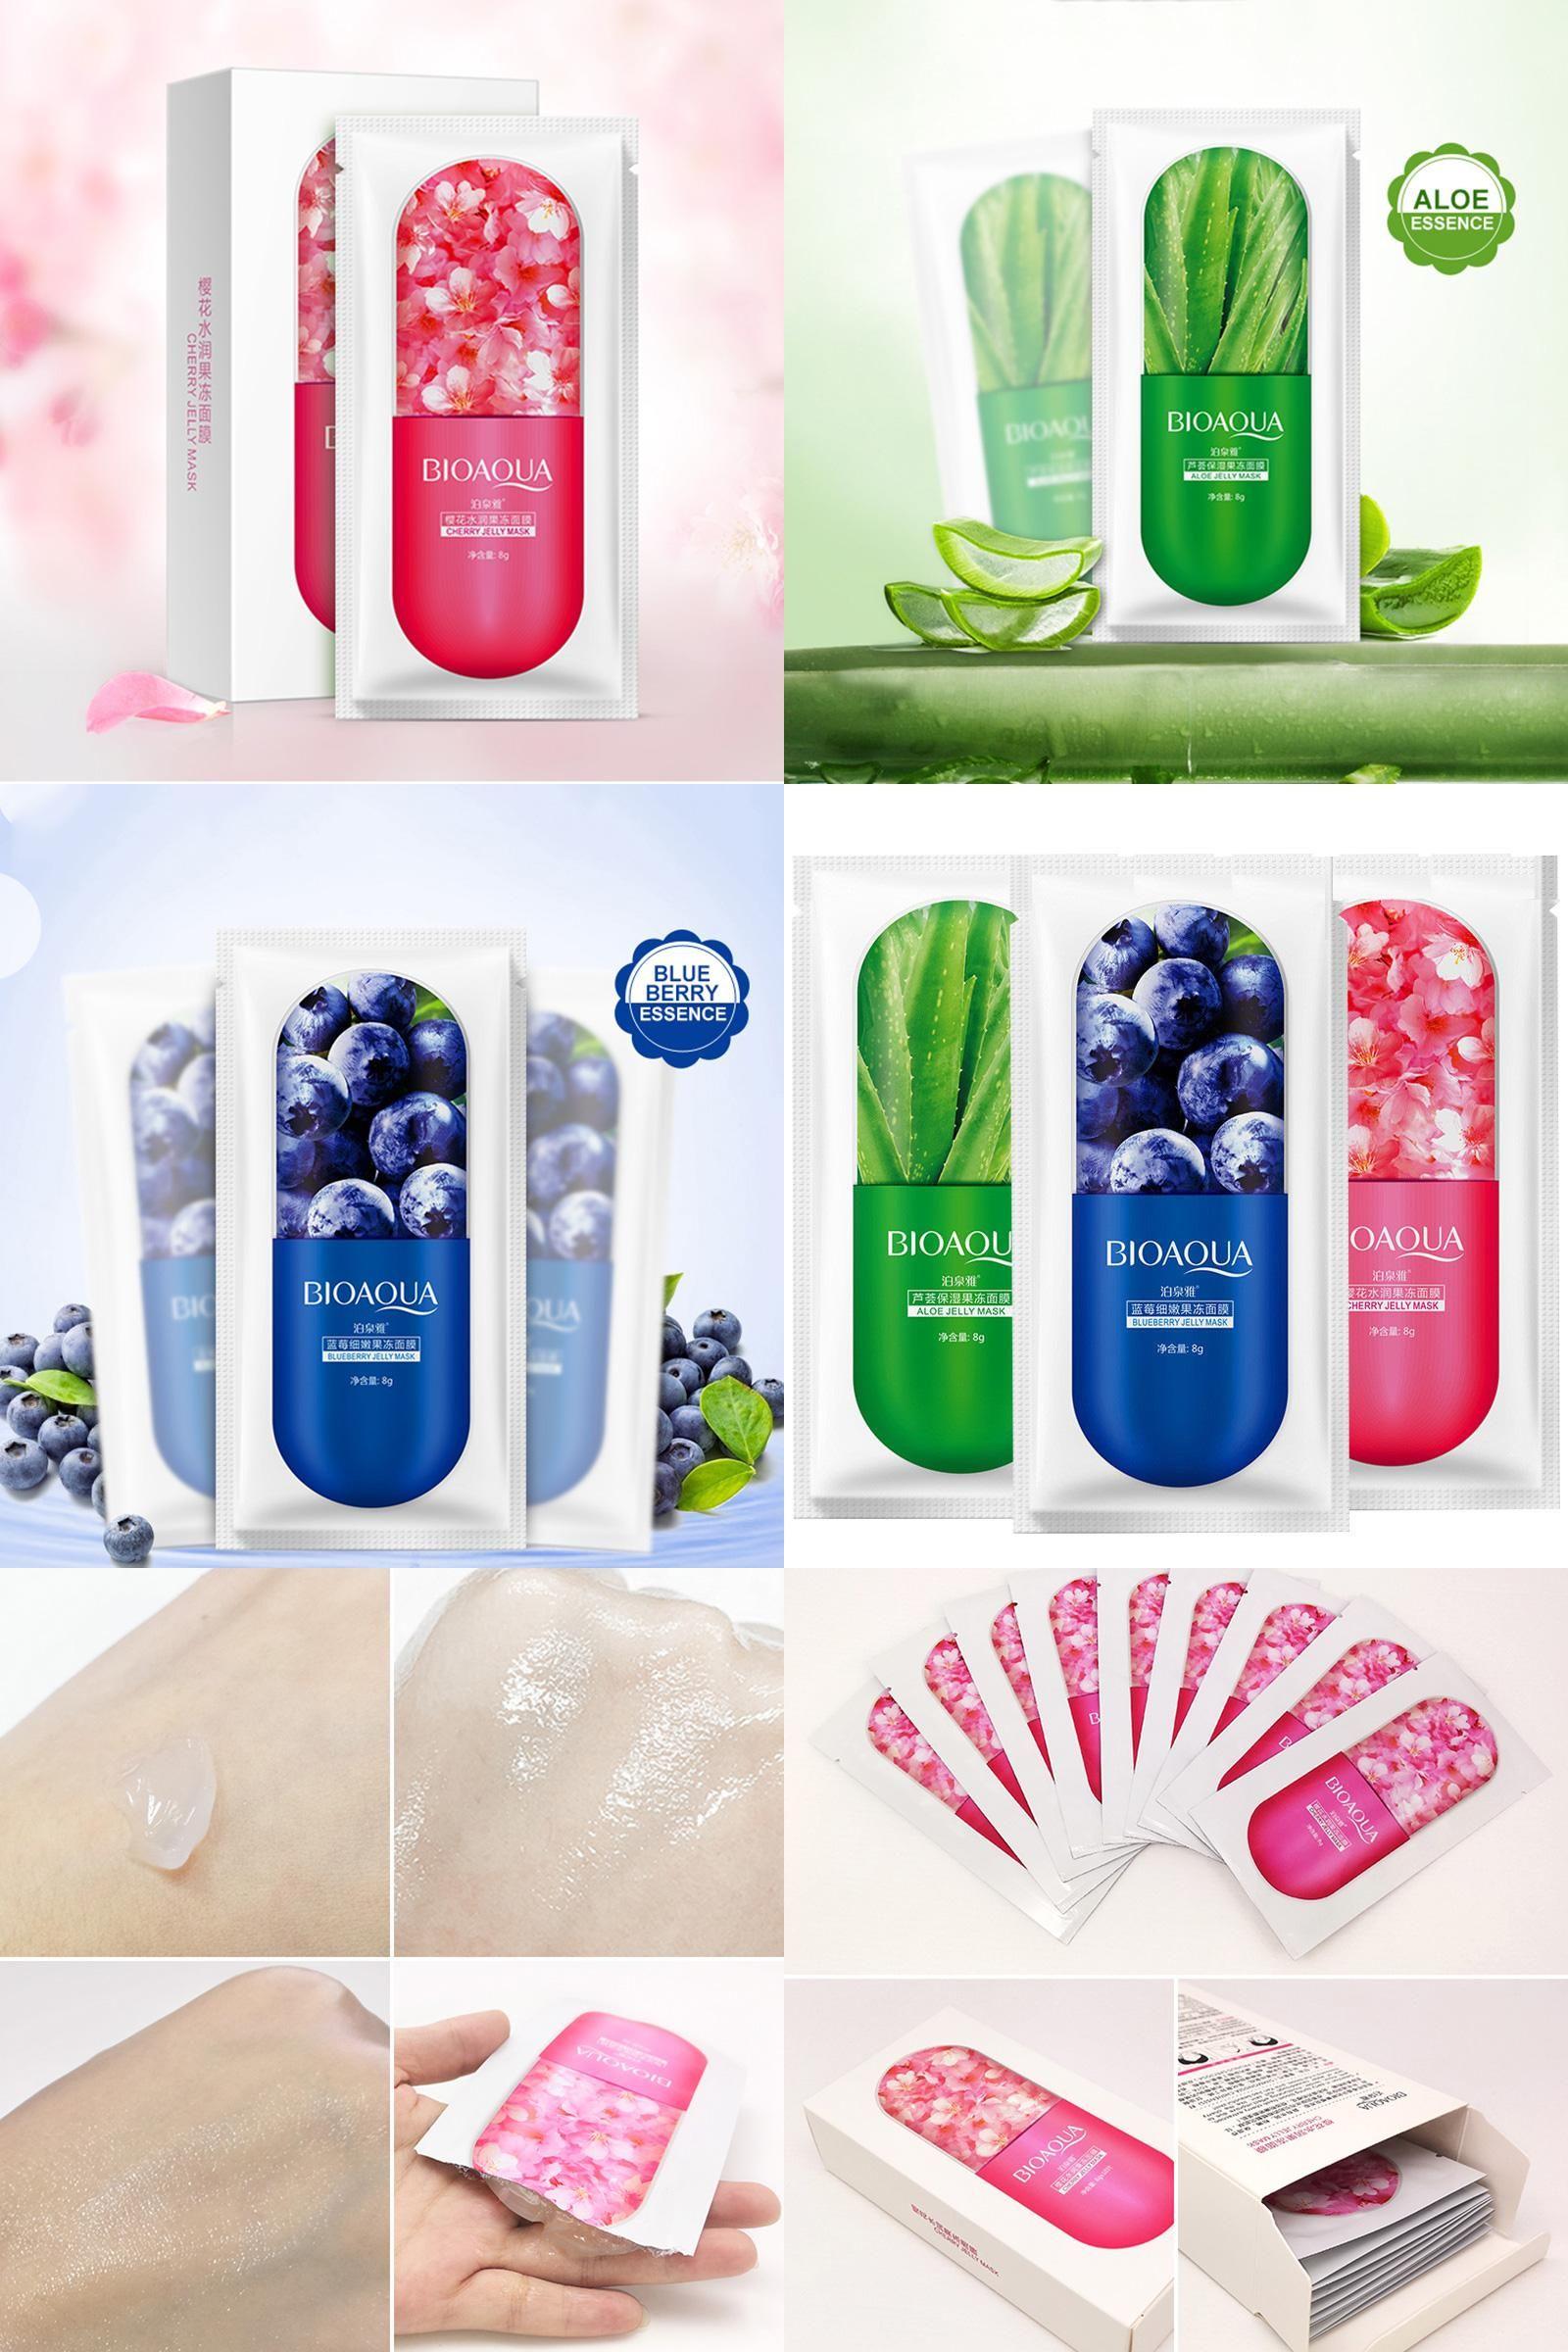 Visit To Buy Bioaqua Jelly Mask Face Care Aloe Vera Blueberry Gel Original Cherry